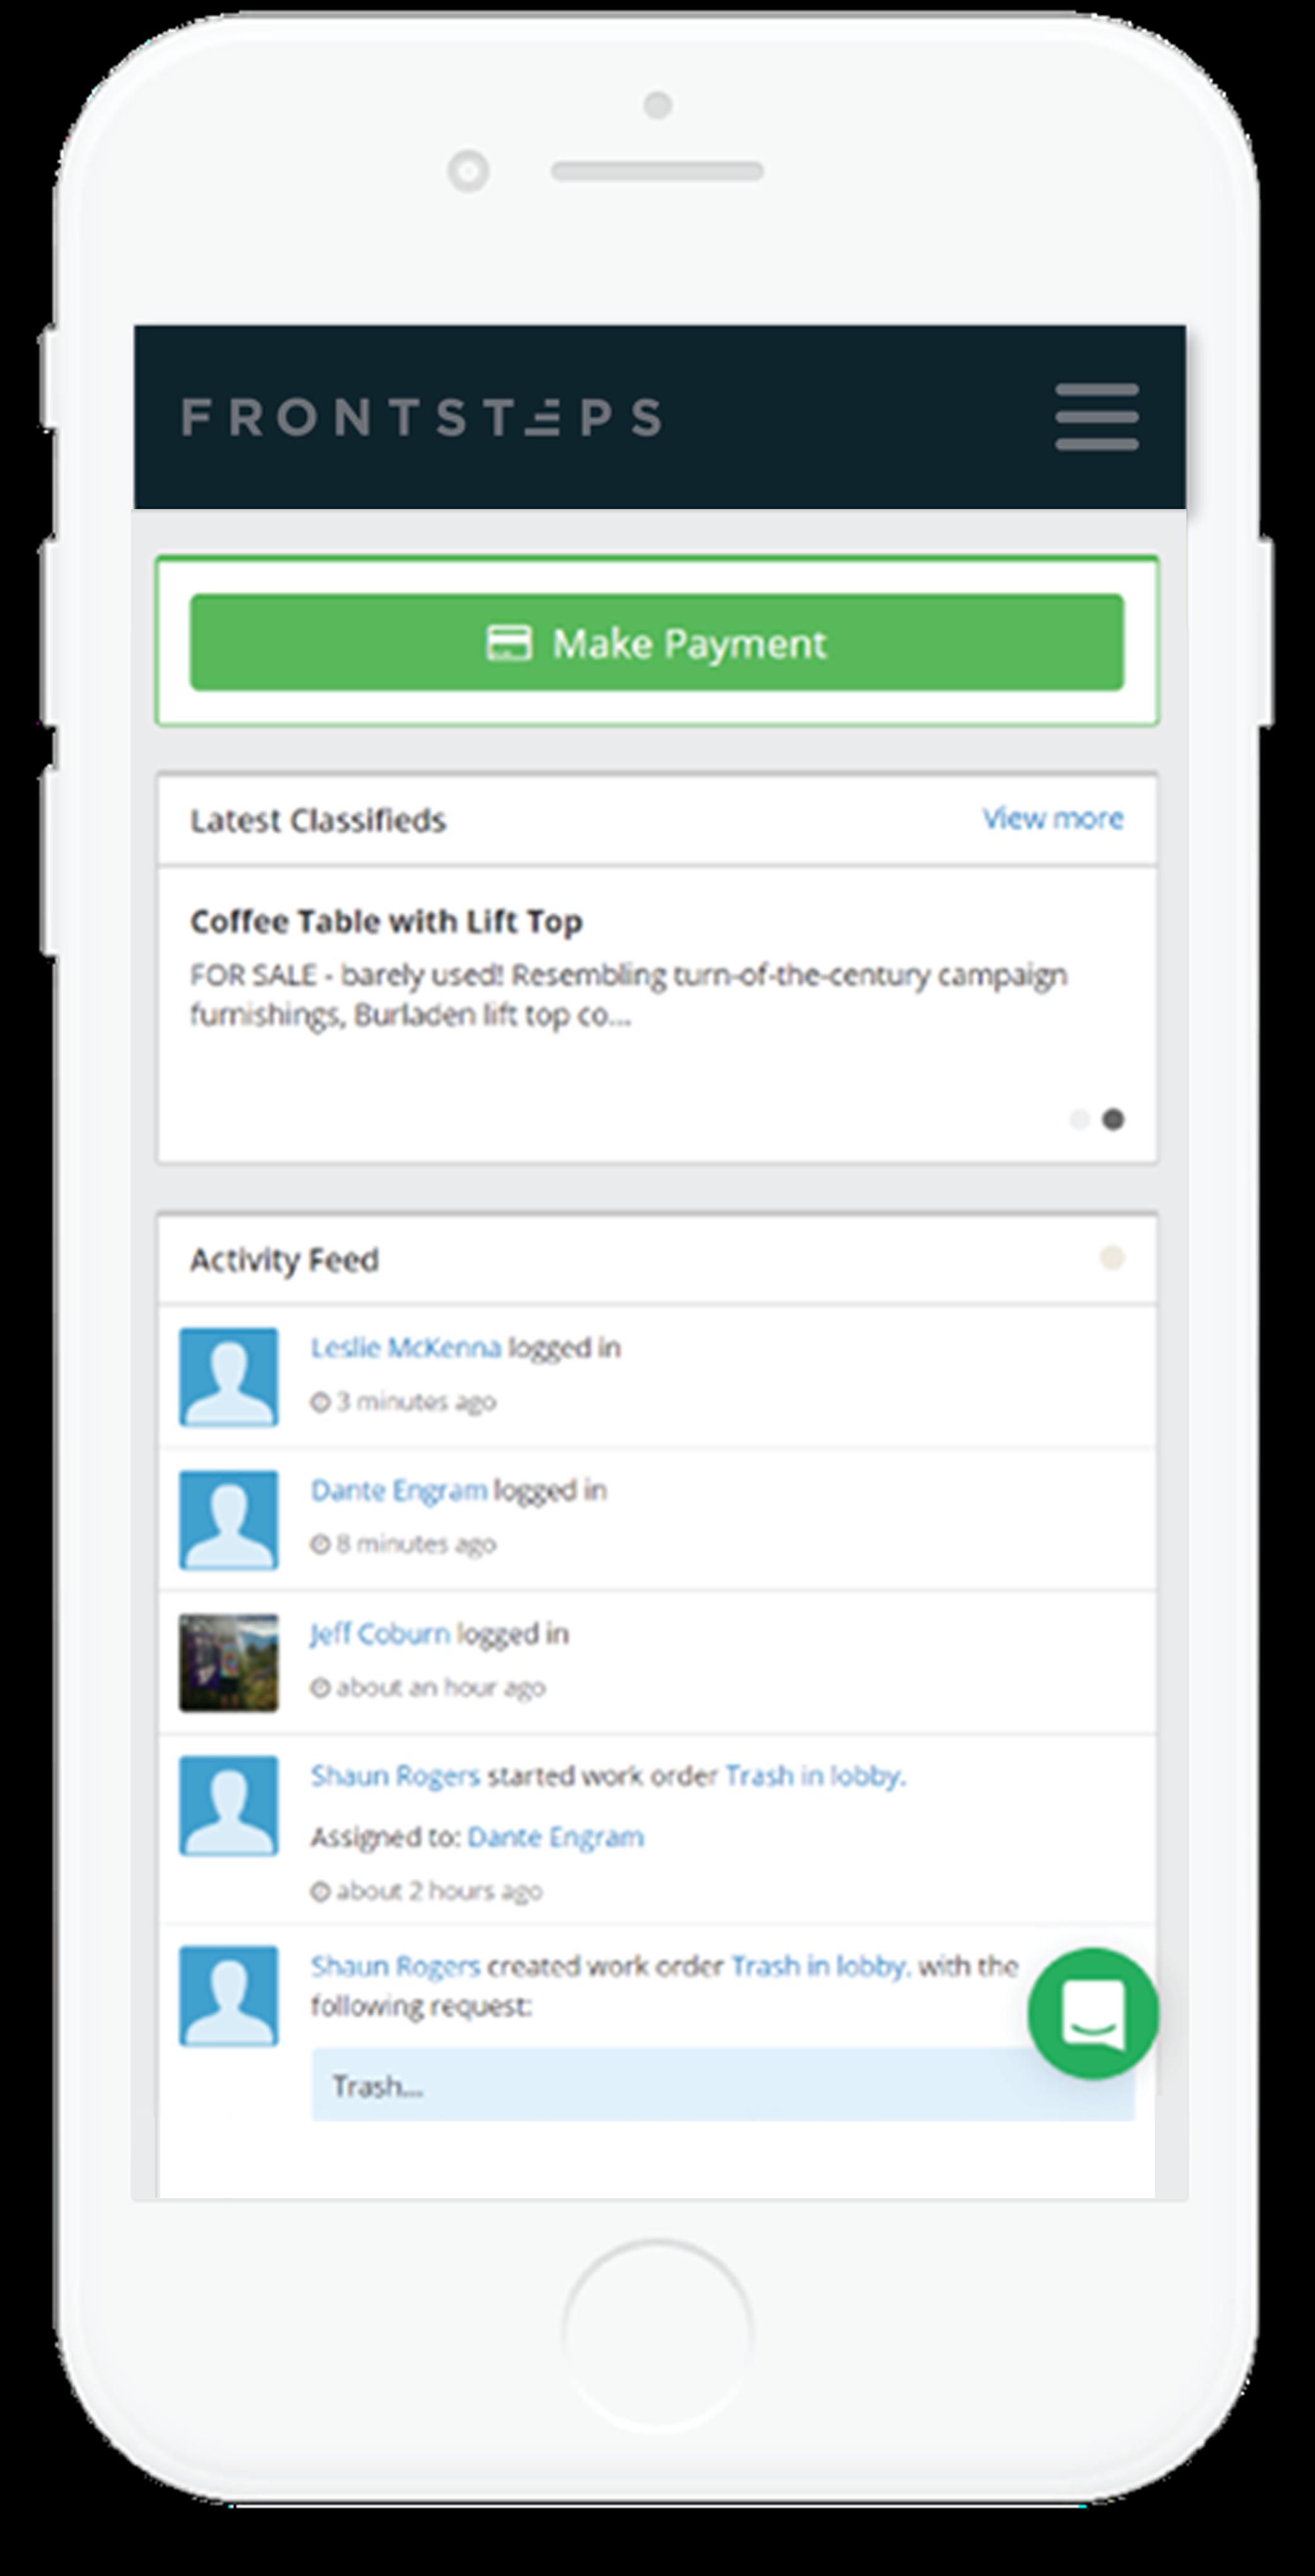 Mobile Bulletin Board Interface